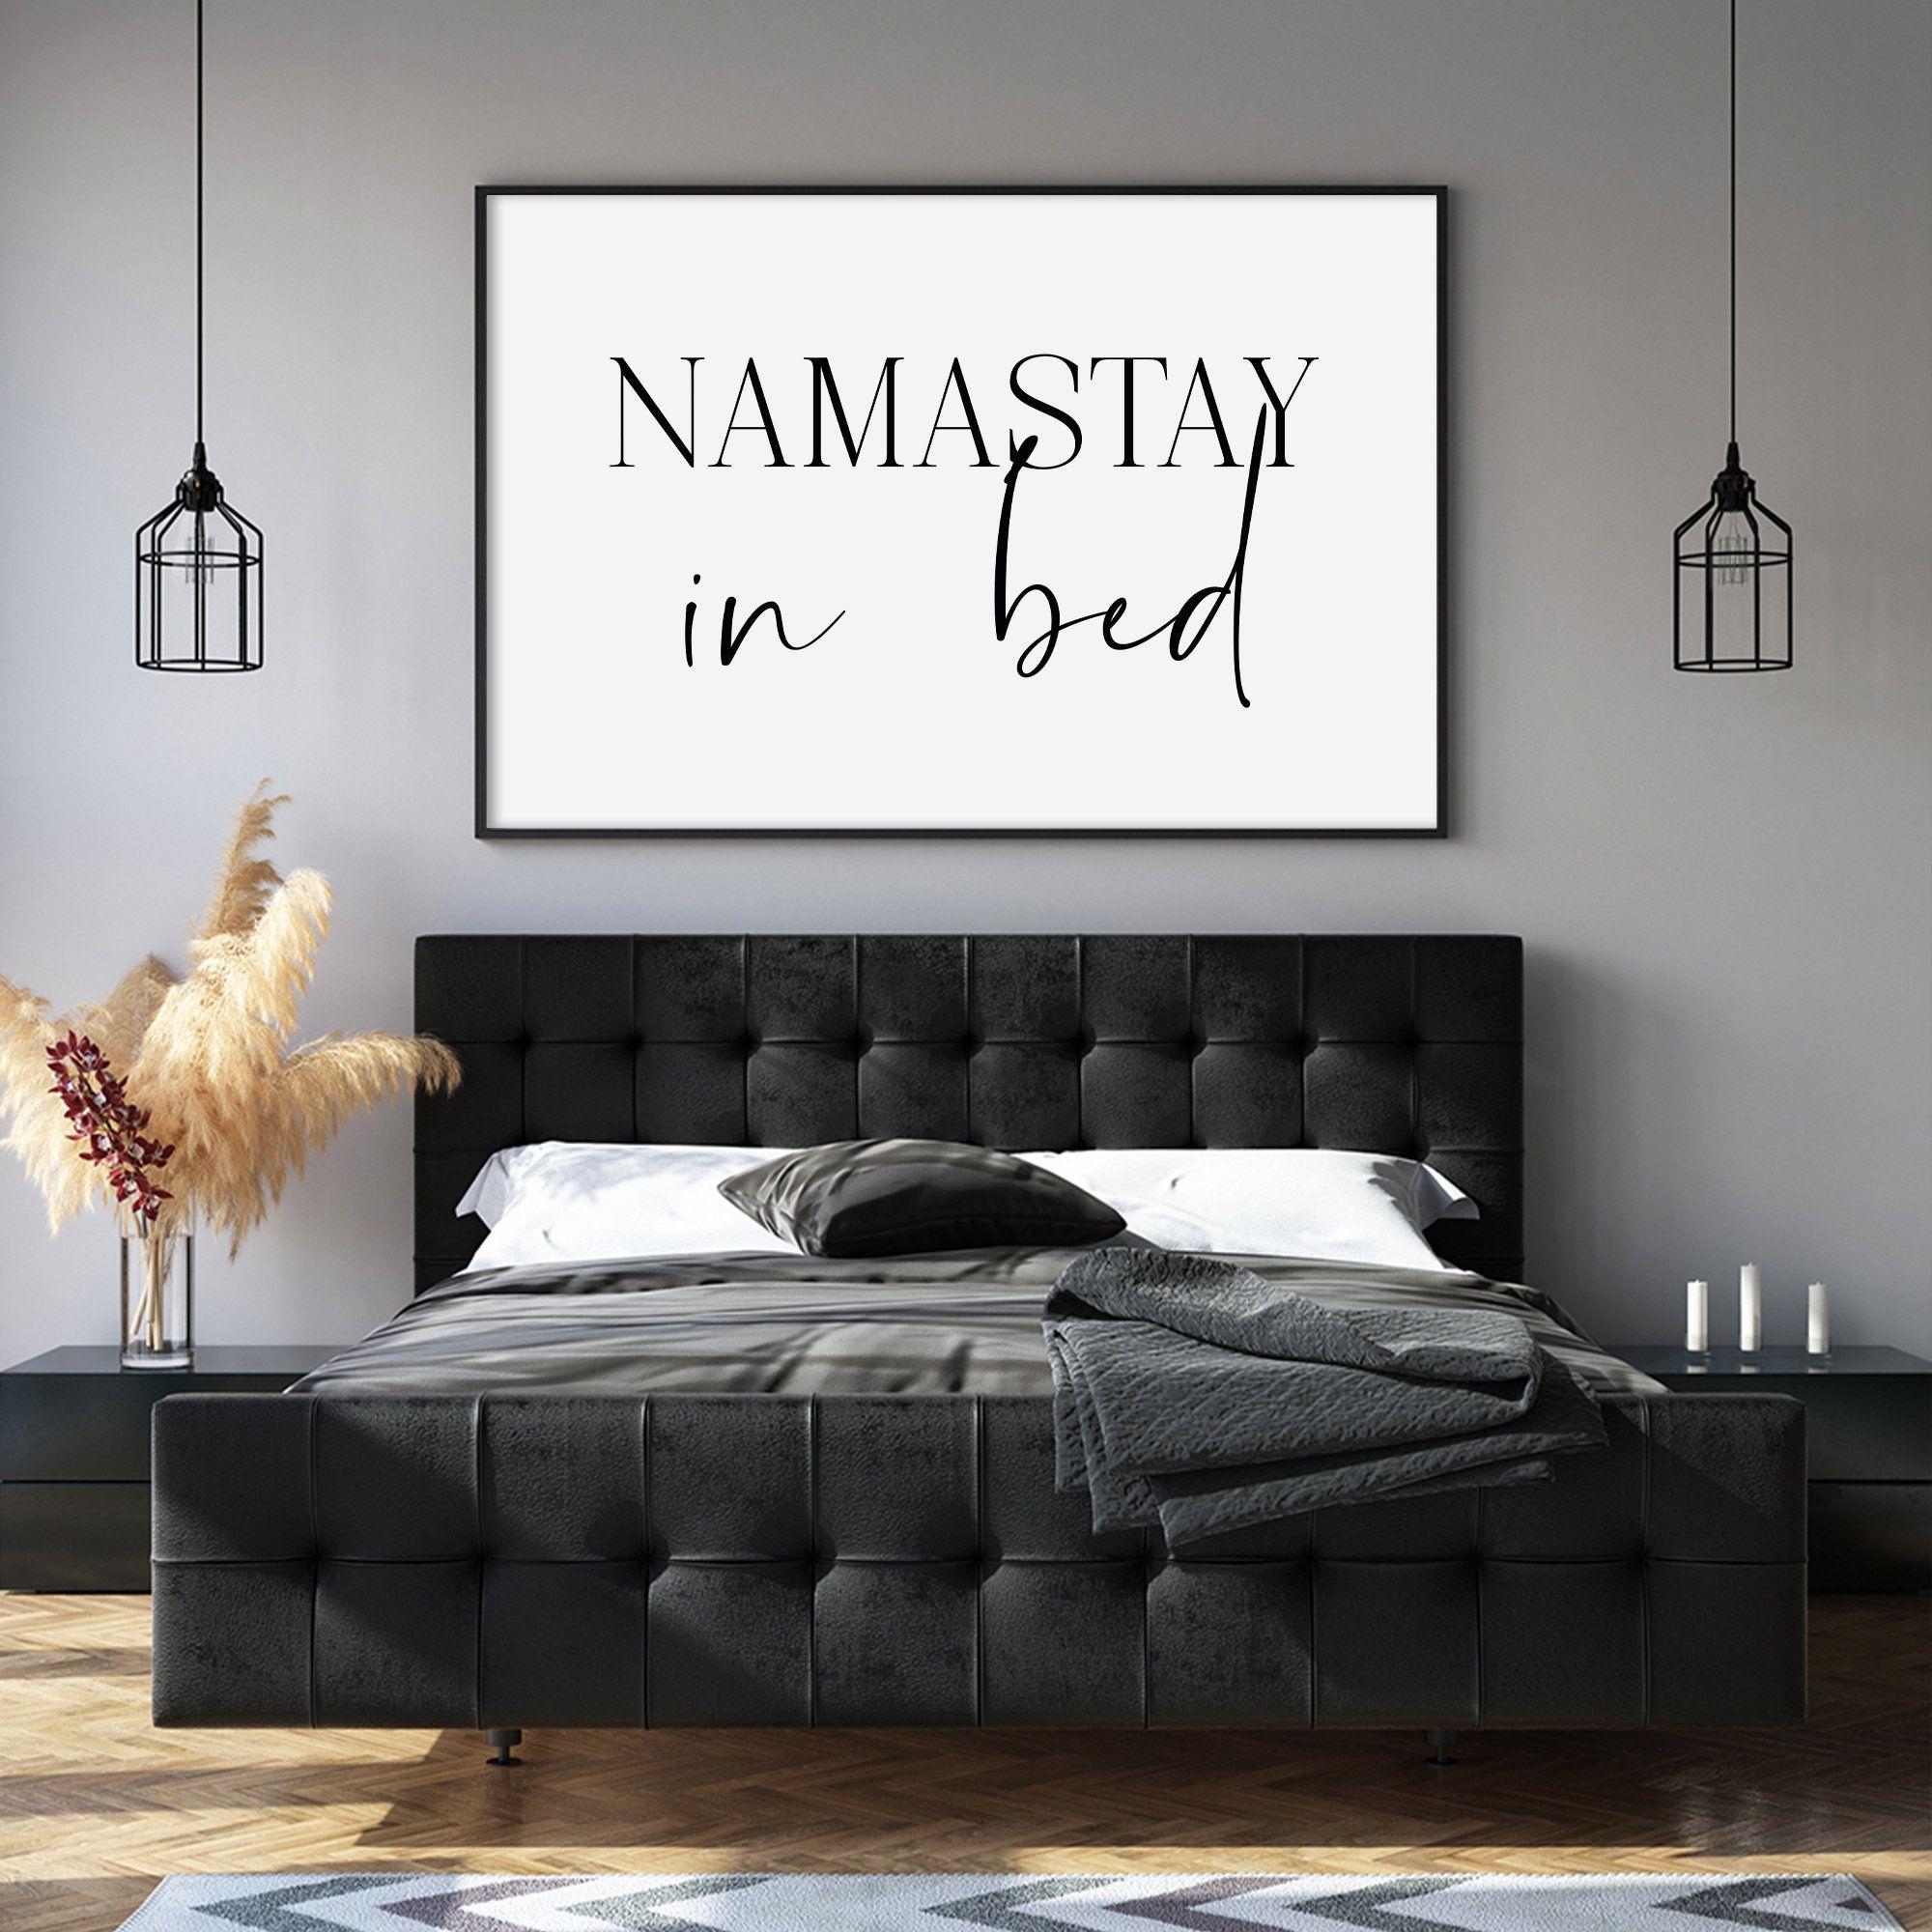 Namastay In Bed Namaste Wall Art Namastay In Bed Sign Above Etsy Wall Decor Bedroom Master Bedroom Wall Decor Above Bed Decor